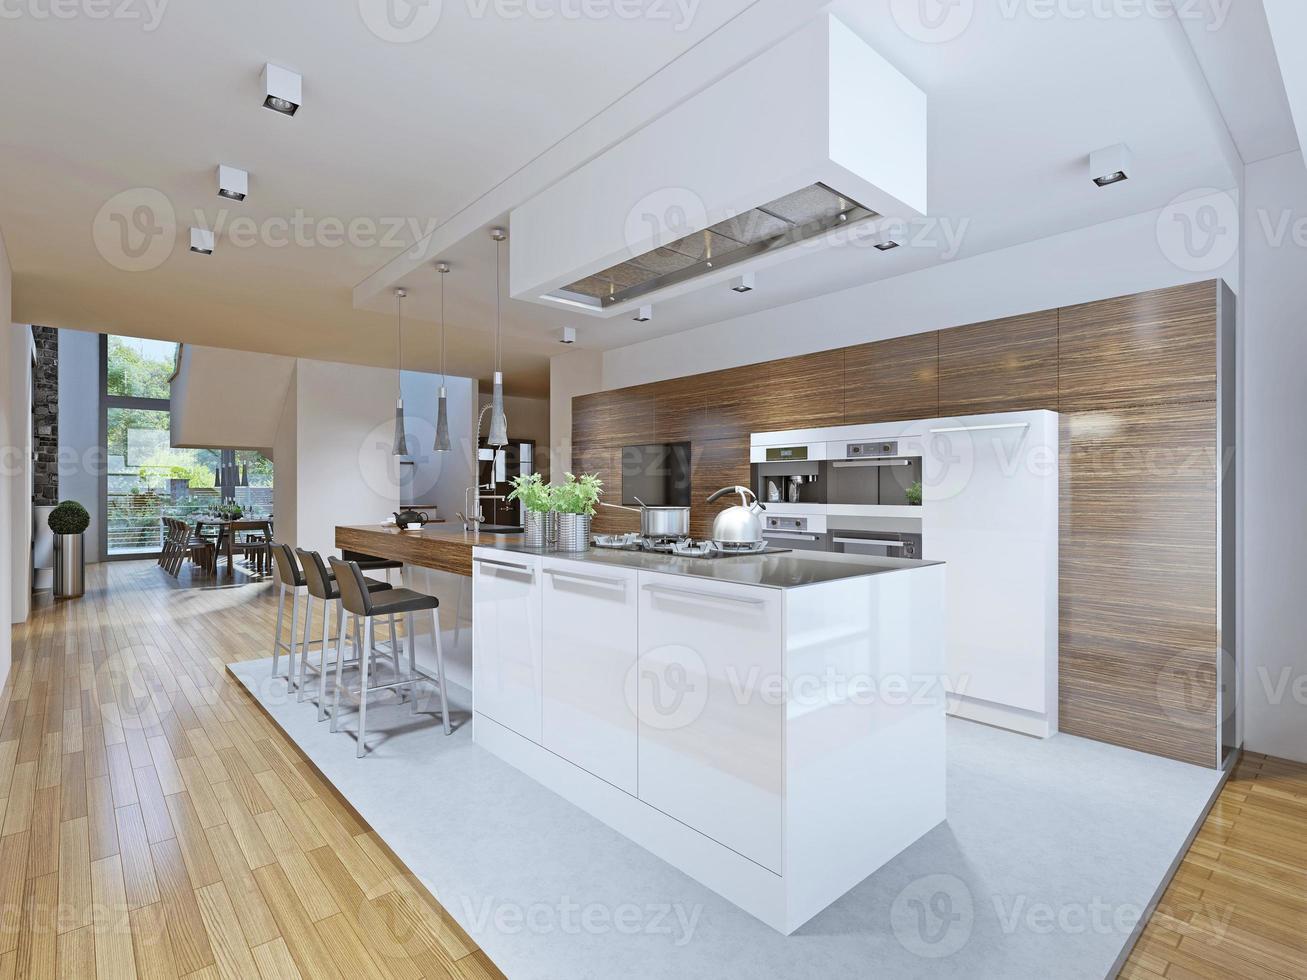 cucina luminosa in stile avant-garde foto